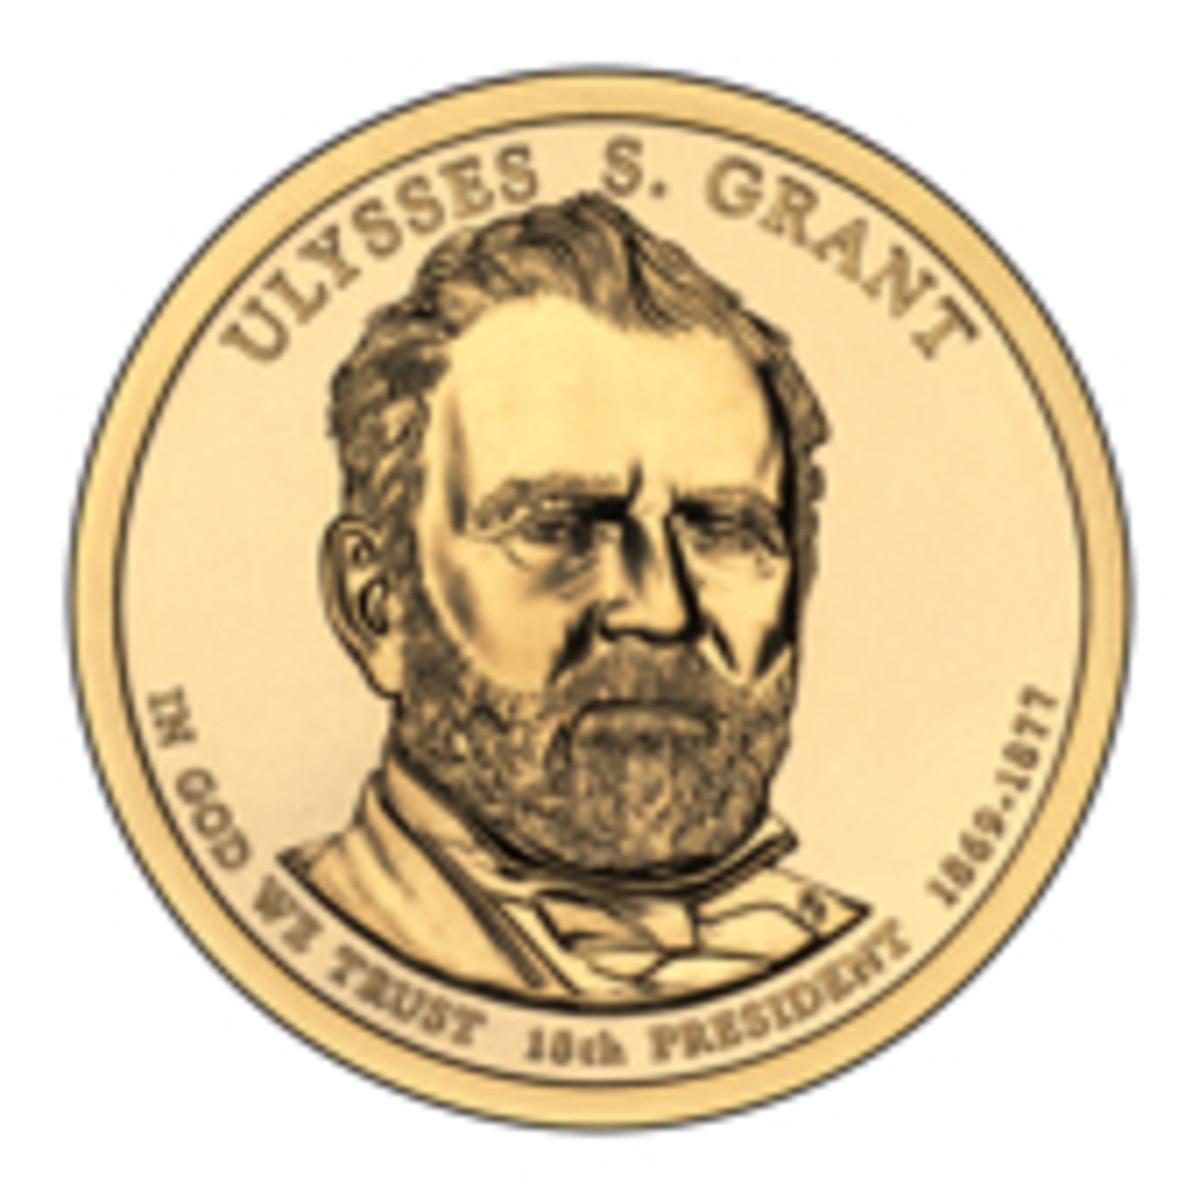 Grant Presidential Dollar Coin